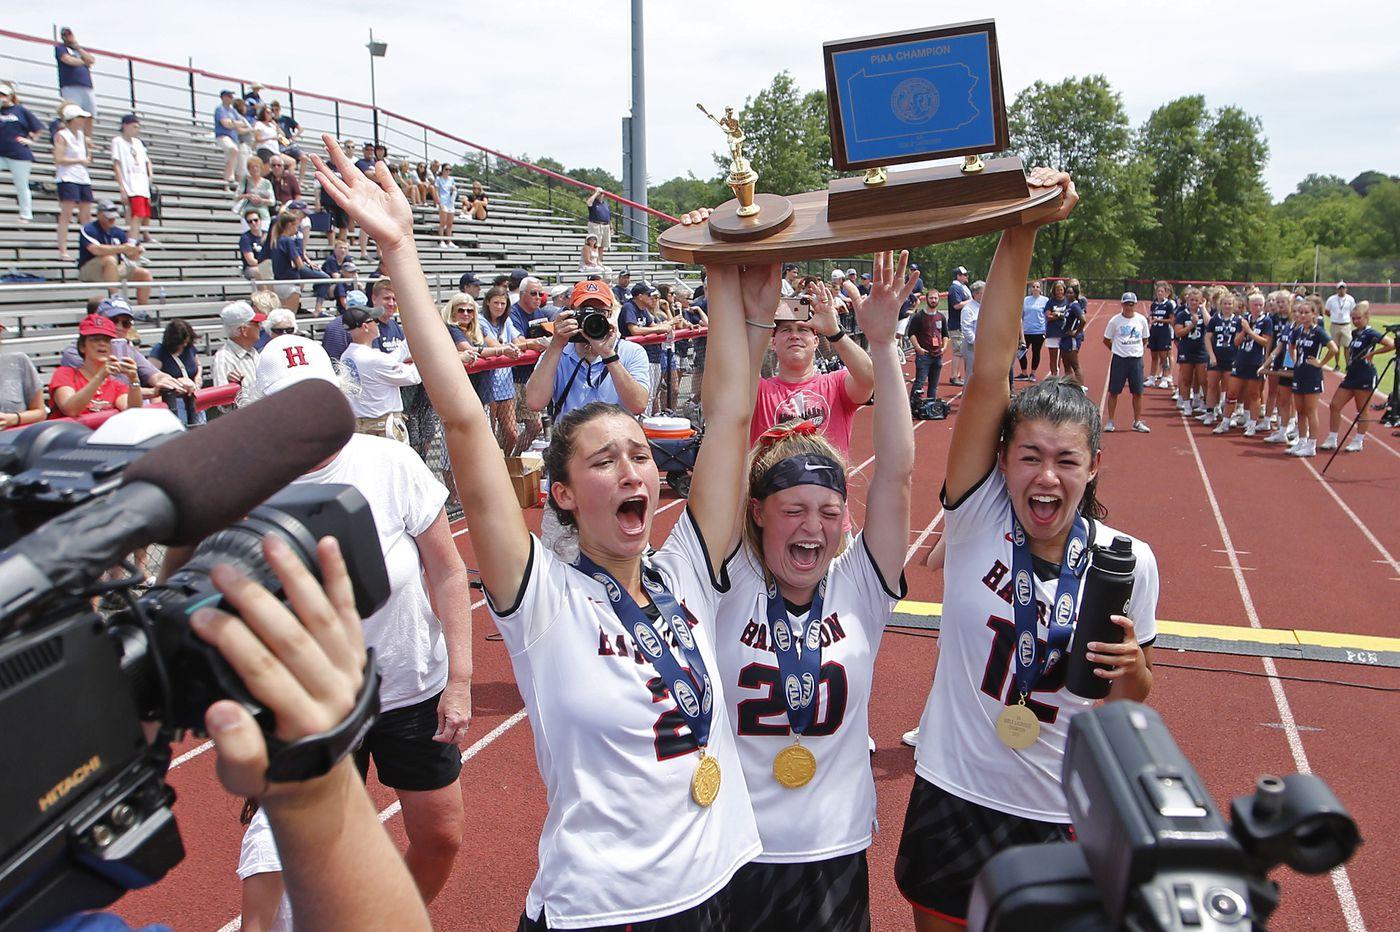 Harriton pulls away to win girls' Class 3A PIAA state lacrosse championship